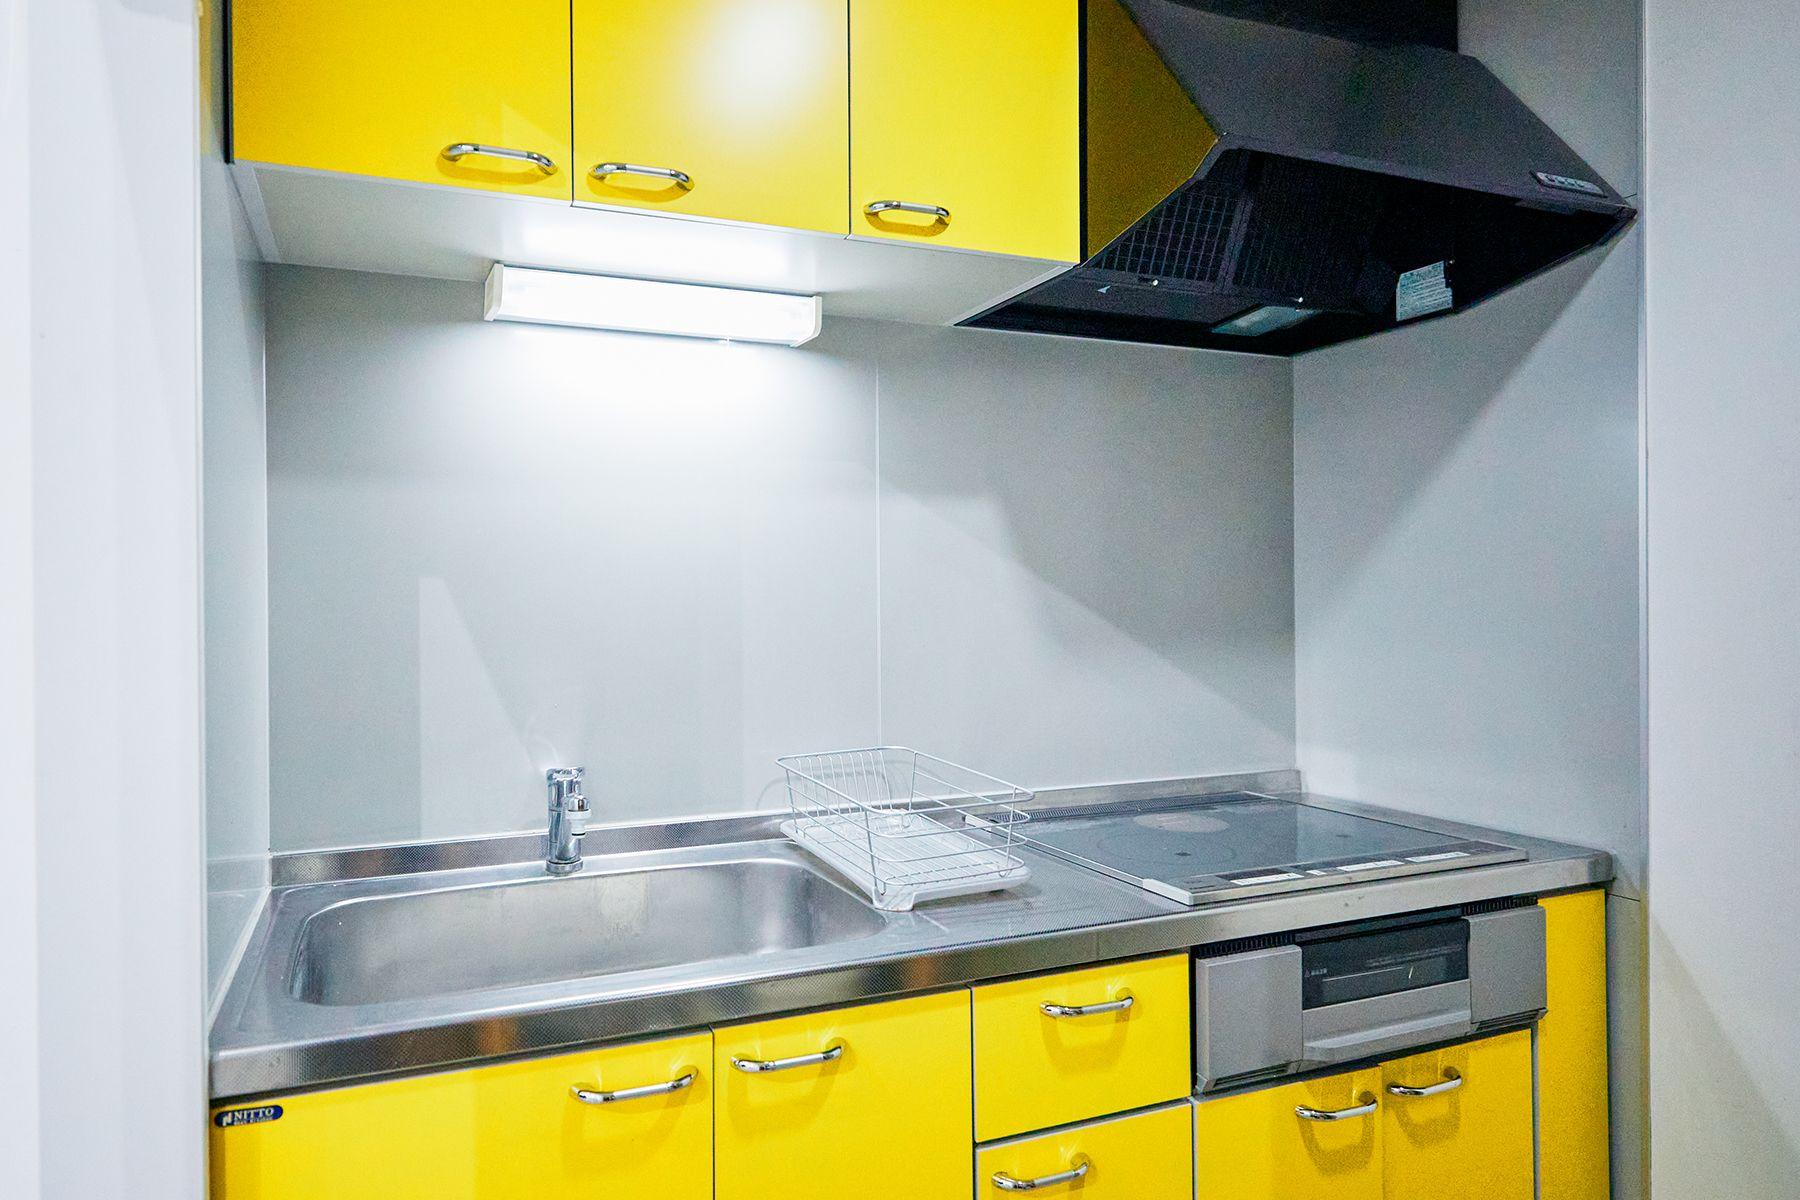 sinca studio 中野坂上 (シンカ スタジオ)IH型システムキッチン完備